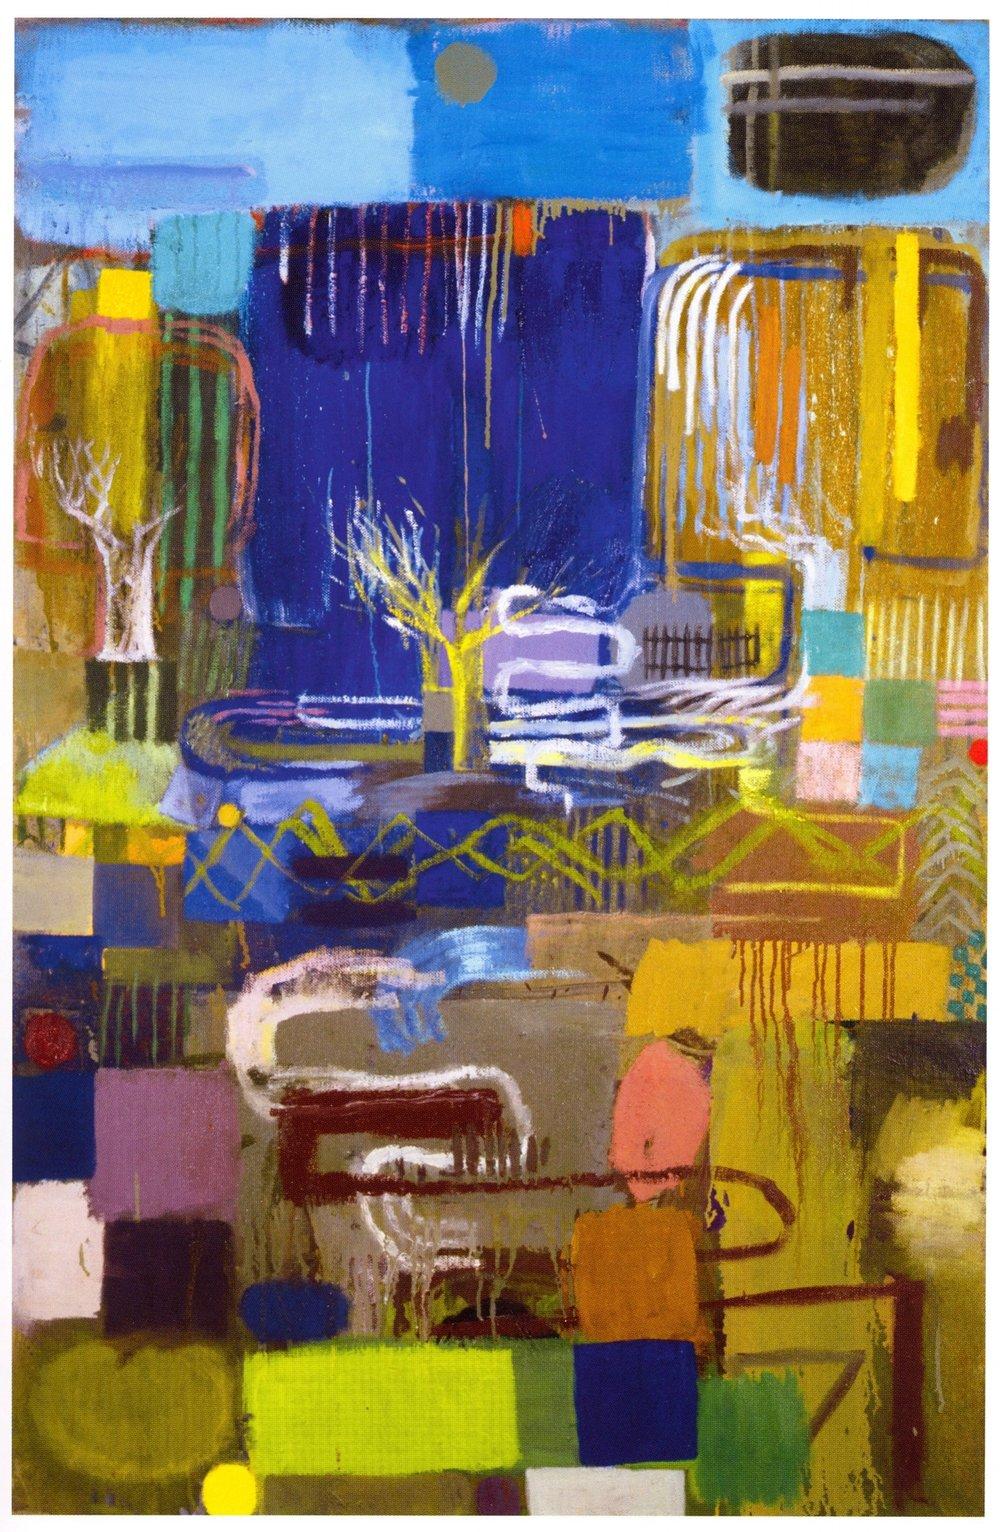 "Mark Kurdziel    Lost in Juarez,   Oil on canvas, 38"" x 58"", 2003"